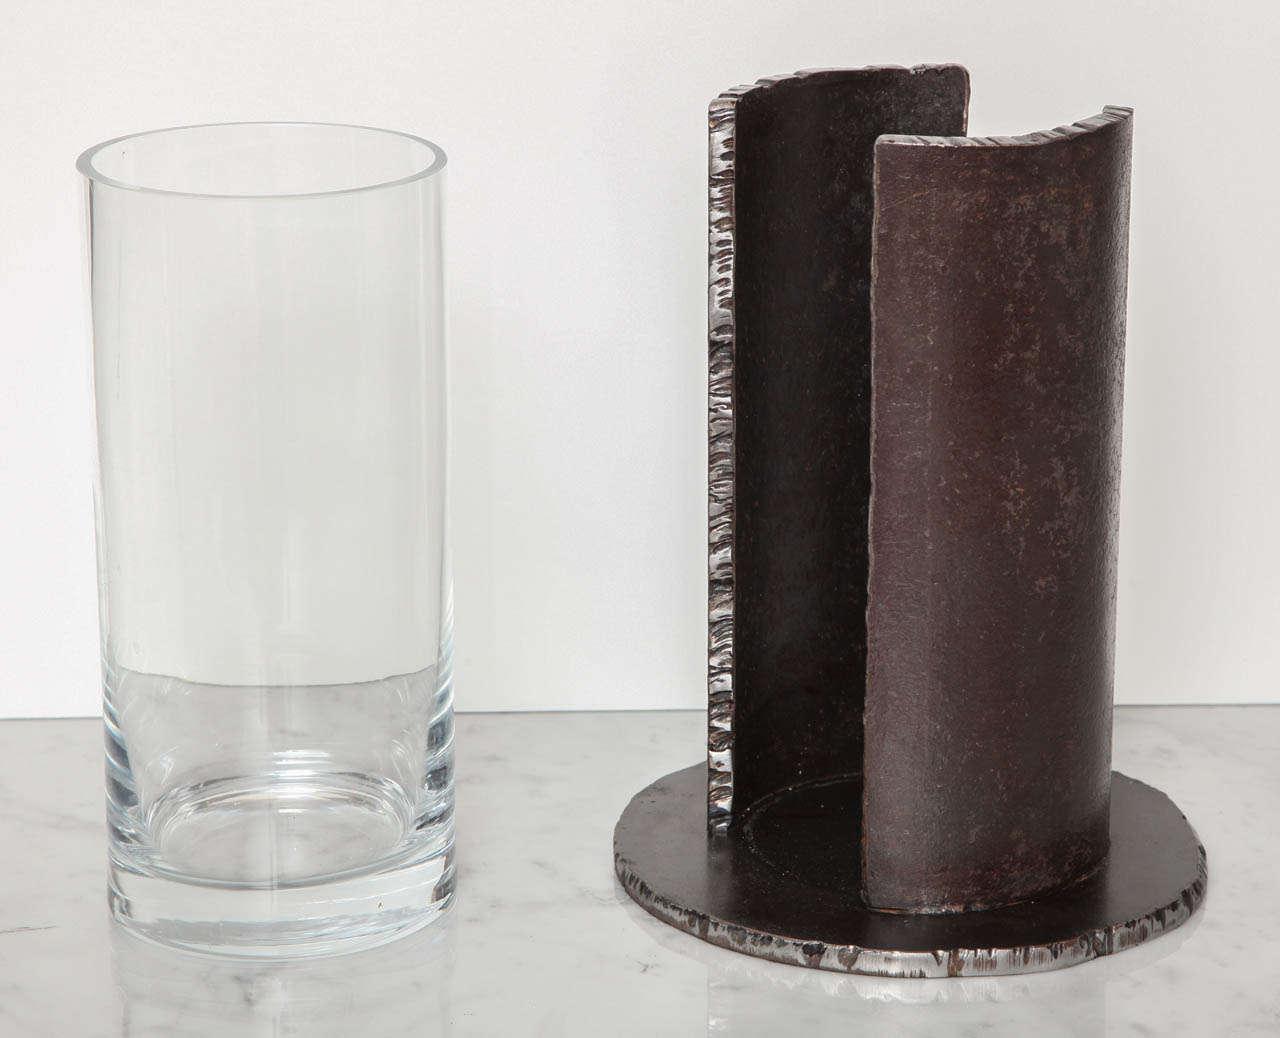 Bernar VENET Vase